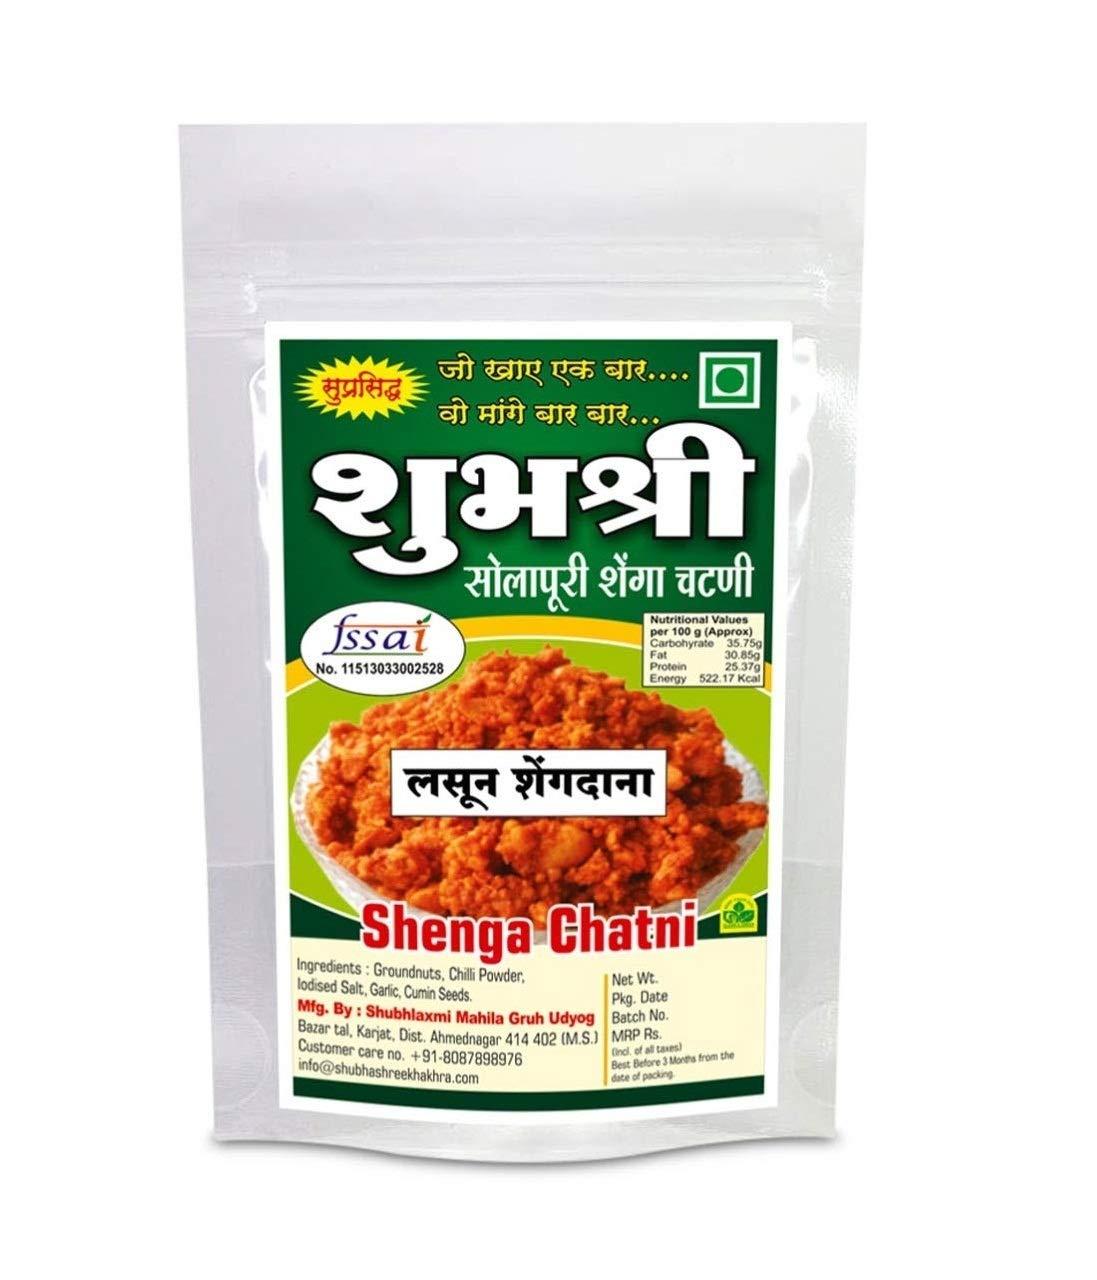 Garlic Peanut [Shenga] Chutney Each 100 gm (3.52 OZ) (Pack of 4)